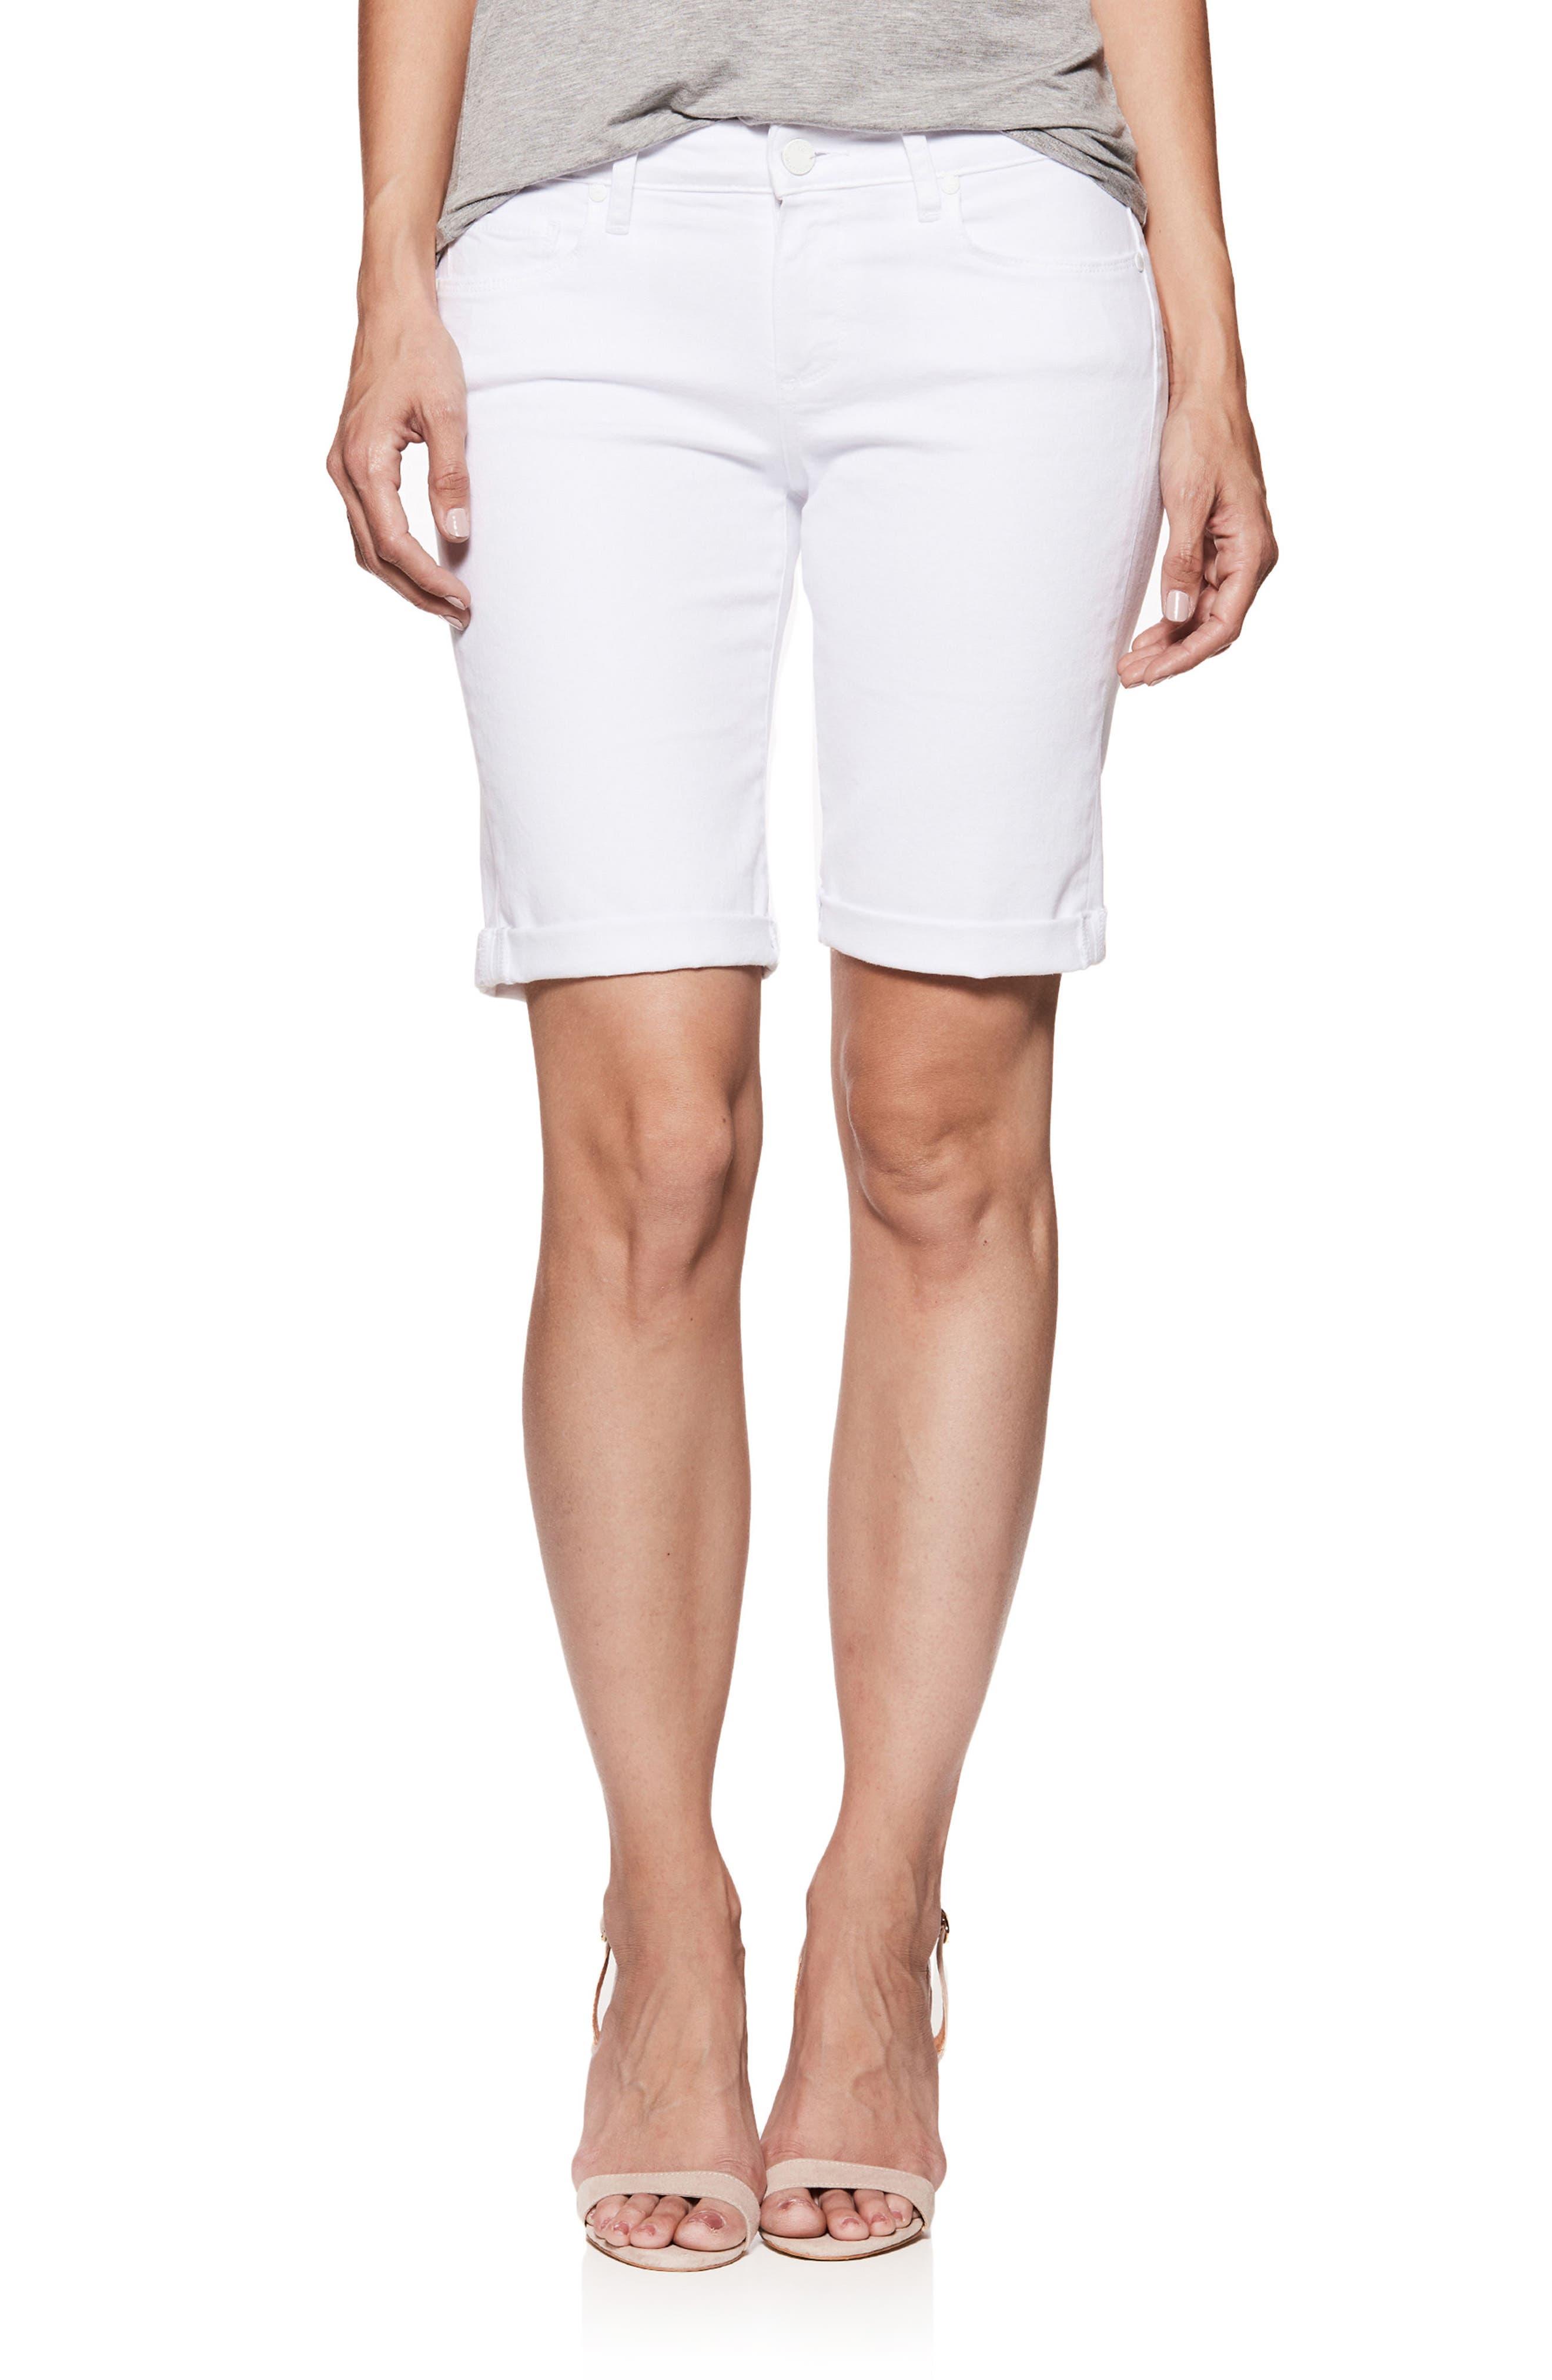 Jax Denim Bermuda Shorts,                             Main thumbnail 1, color,                             CRISP WHITE